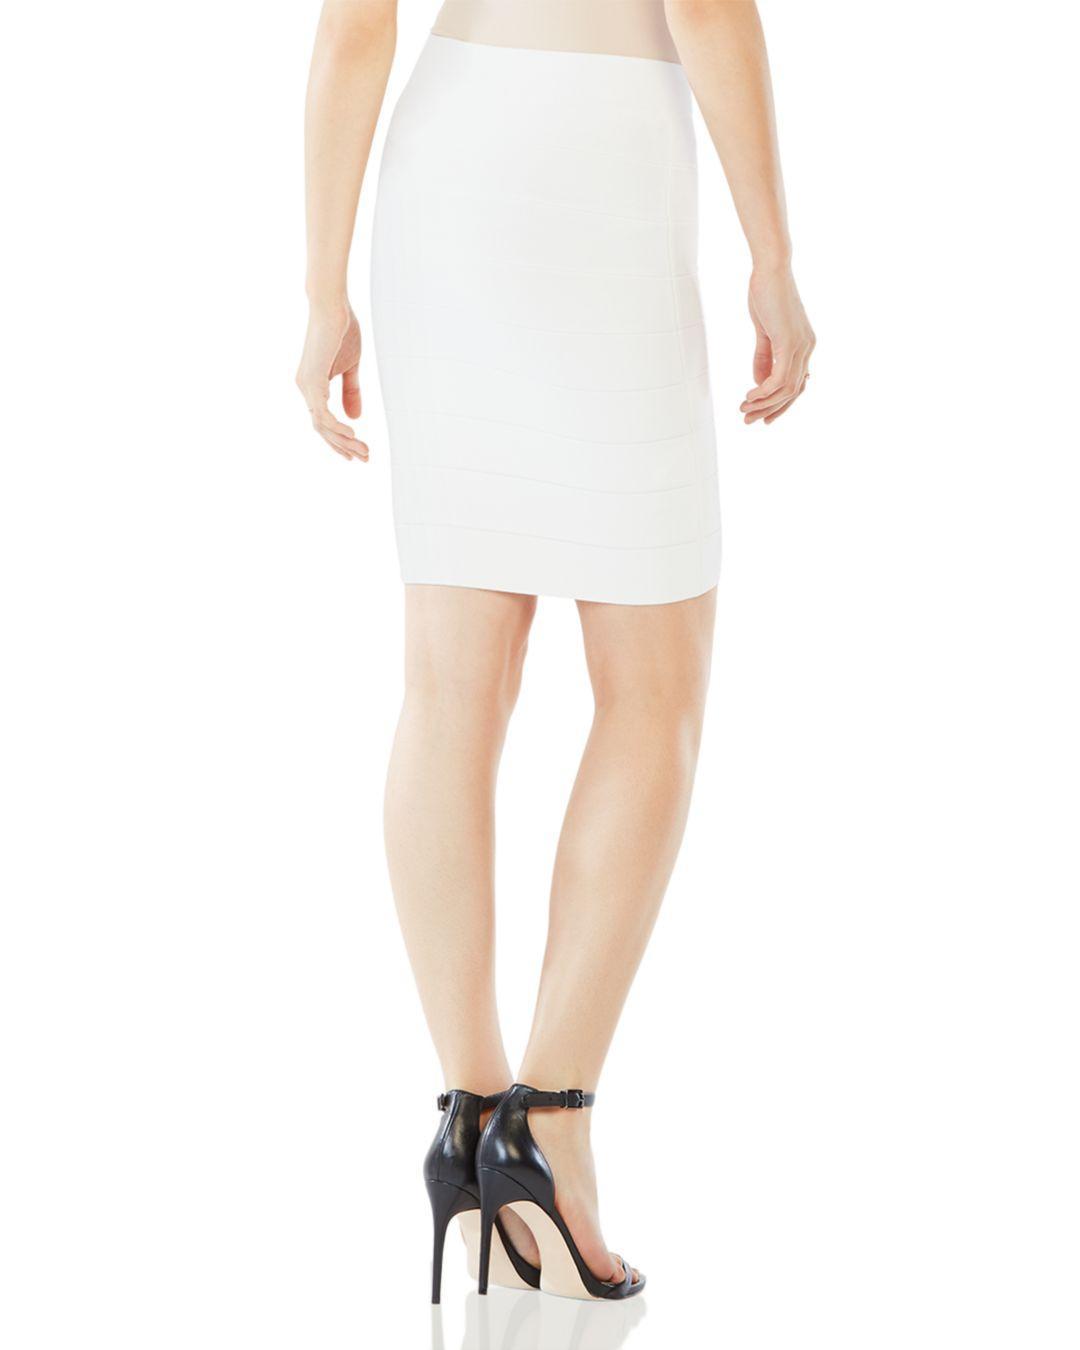 7bc6697f8 BCBGMAXAZRIA Alexa Knit Essential Pencil Skirt in White - Lyst